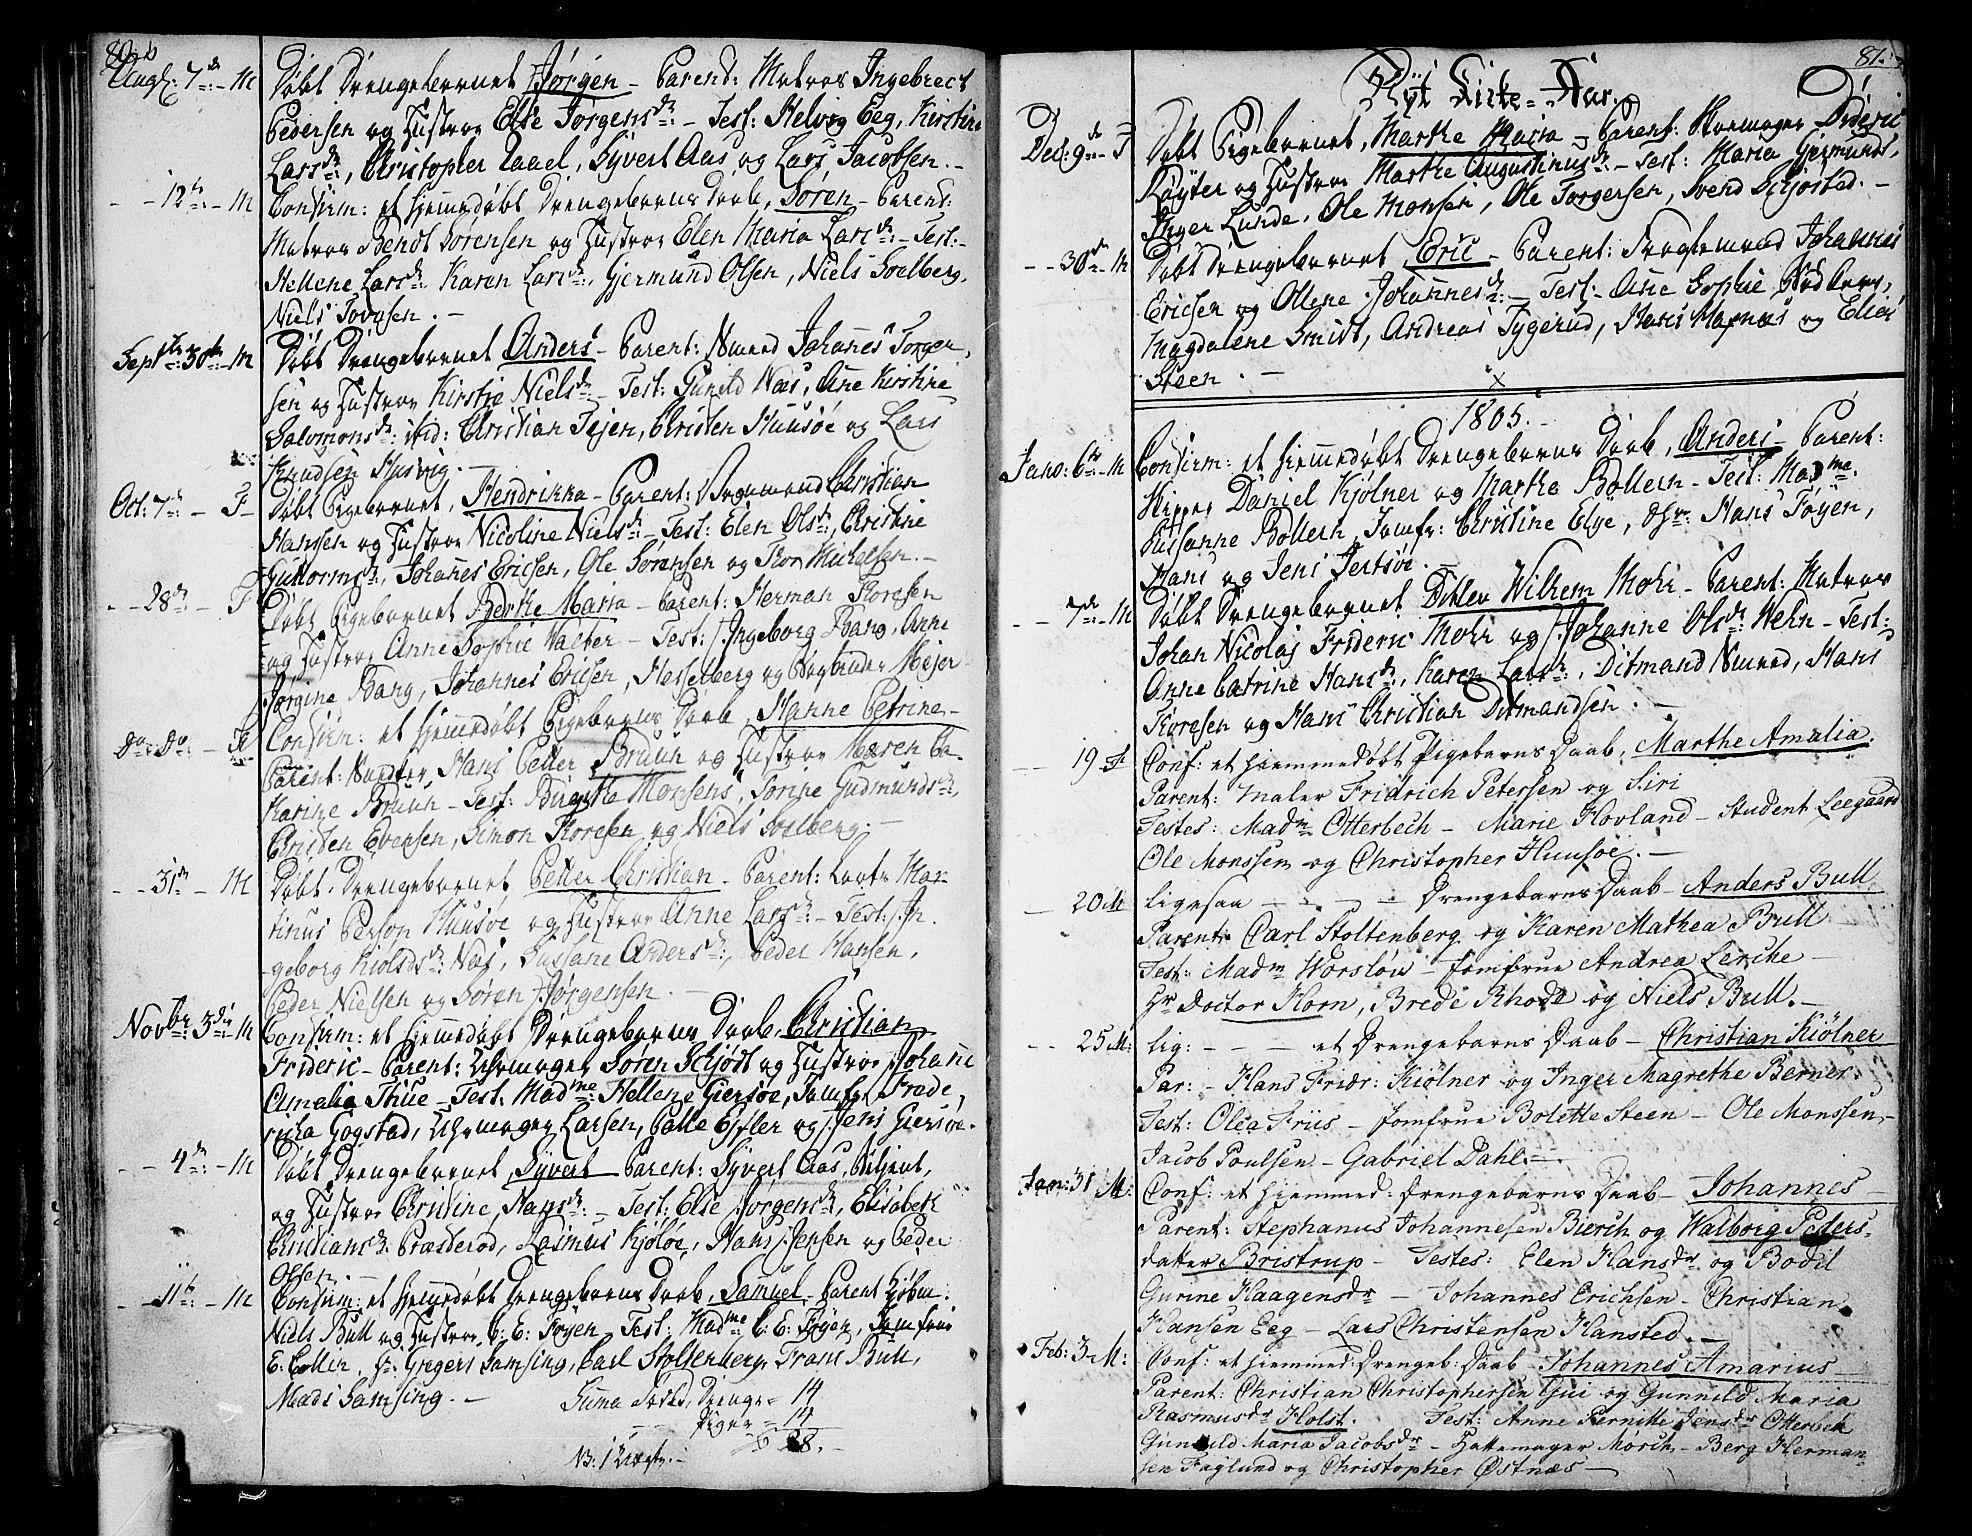 SAKO, Tønsberg kirkebøker, F/Fa/L0003: Ministerialbok nr. I 3, 1797-1814, s. 80-81